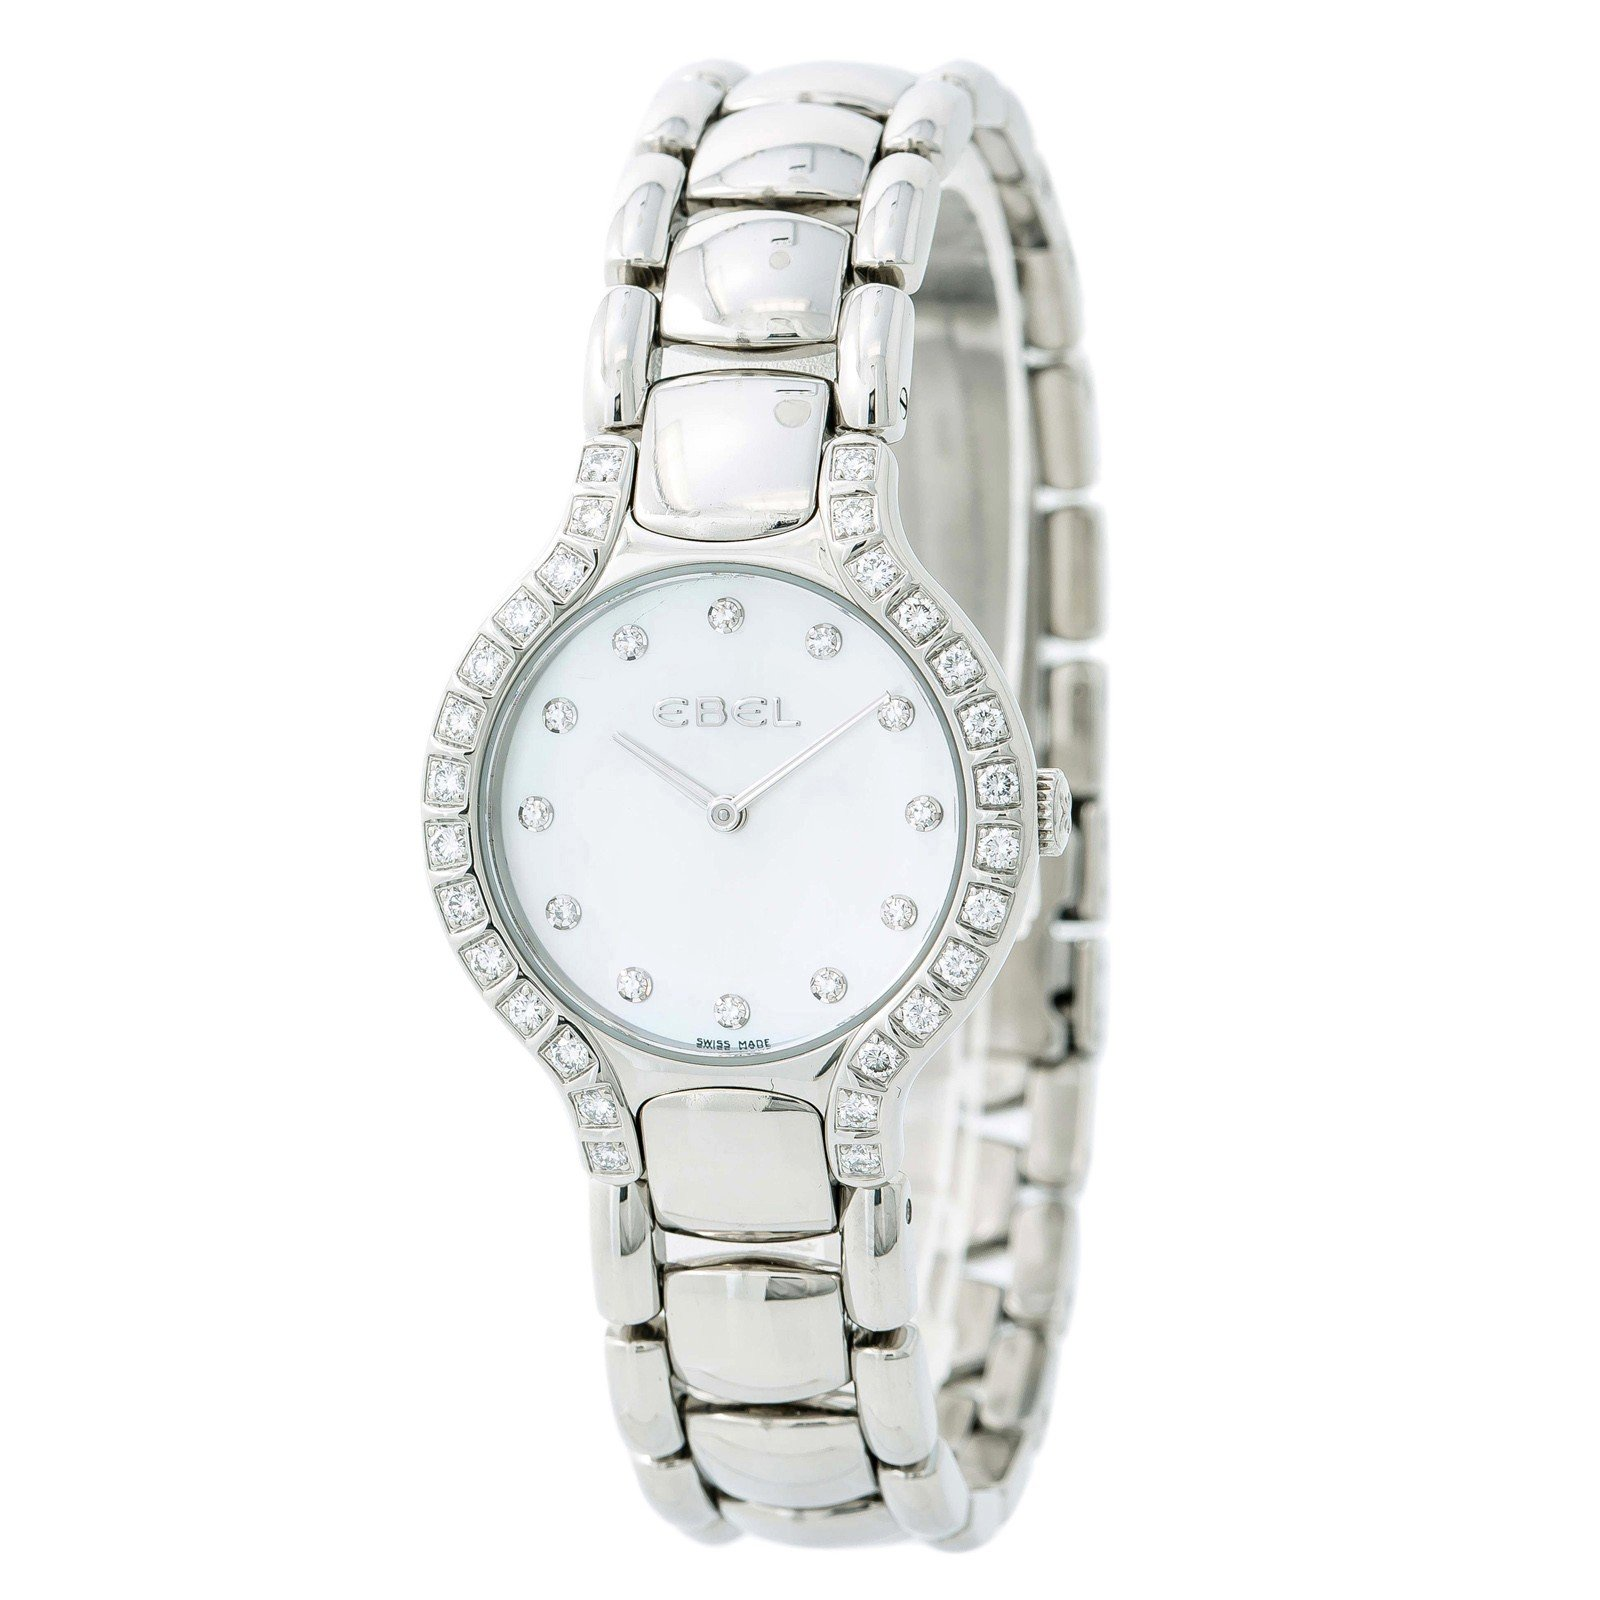 Ebel Beluga quartz womens Watch E9157428-20 (Certified Pre-owned)